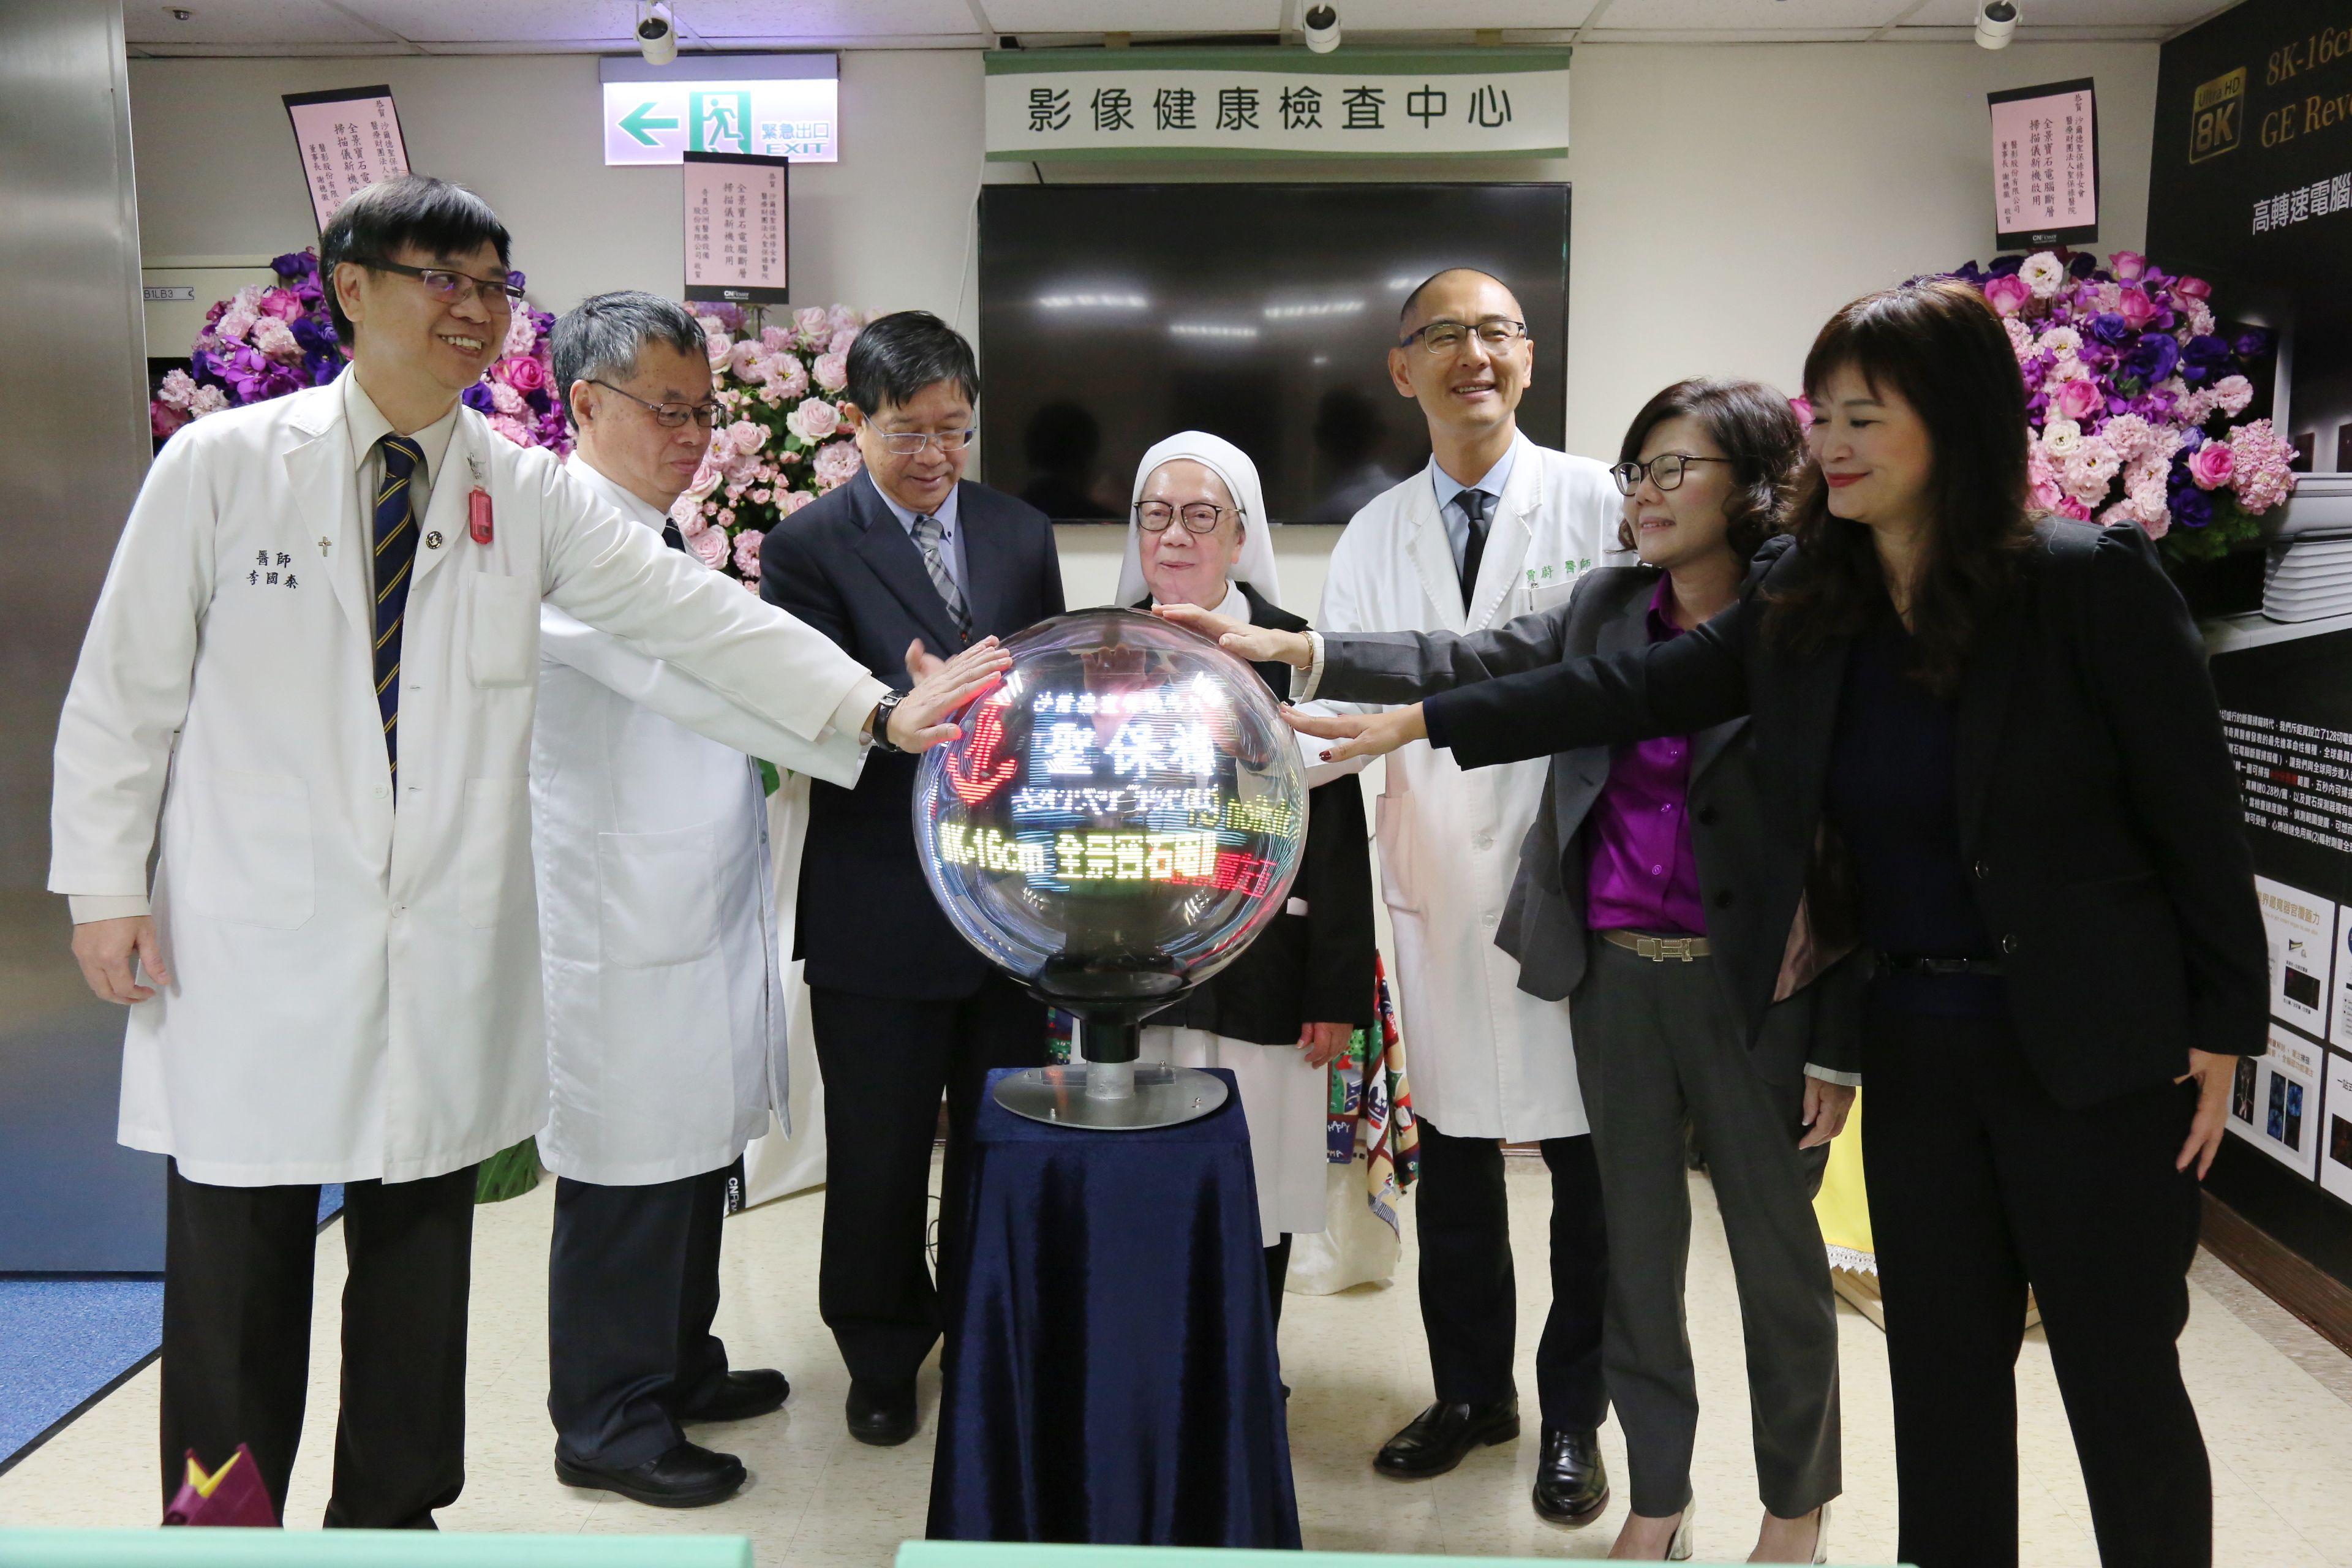 <ul> <li>12月17日啟用桃竹苗第1台、全國第6台的「全景寶石電腦斷層檢查儀」(Revolution CT),具有高解析度、寬覆蓋度、低輻射劑量及快速掃描不受呼吸及不整脈影響等優點。</li> </ul>